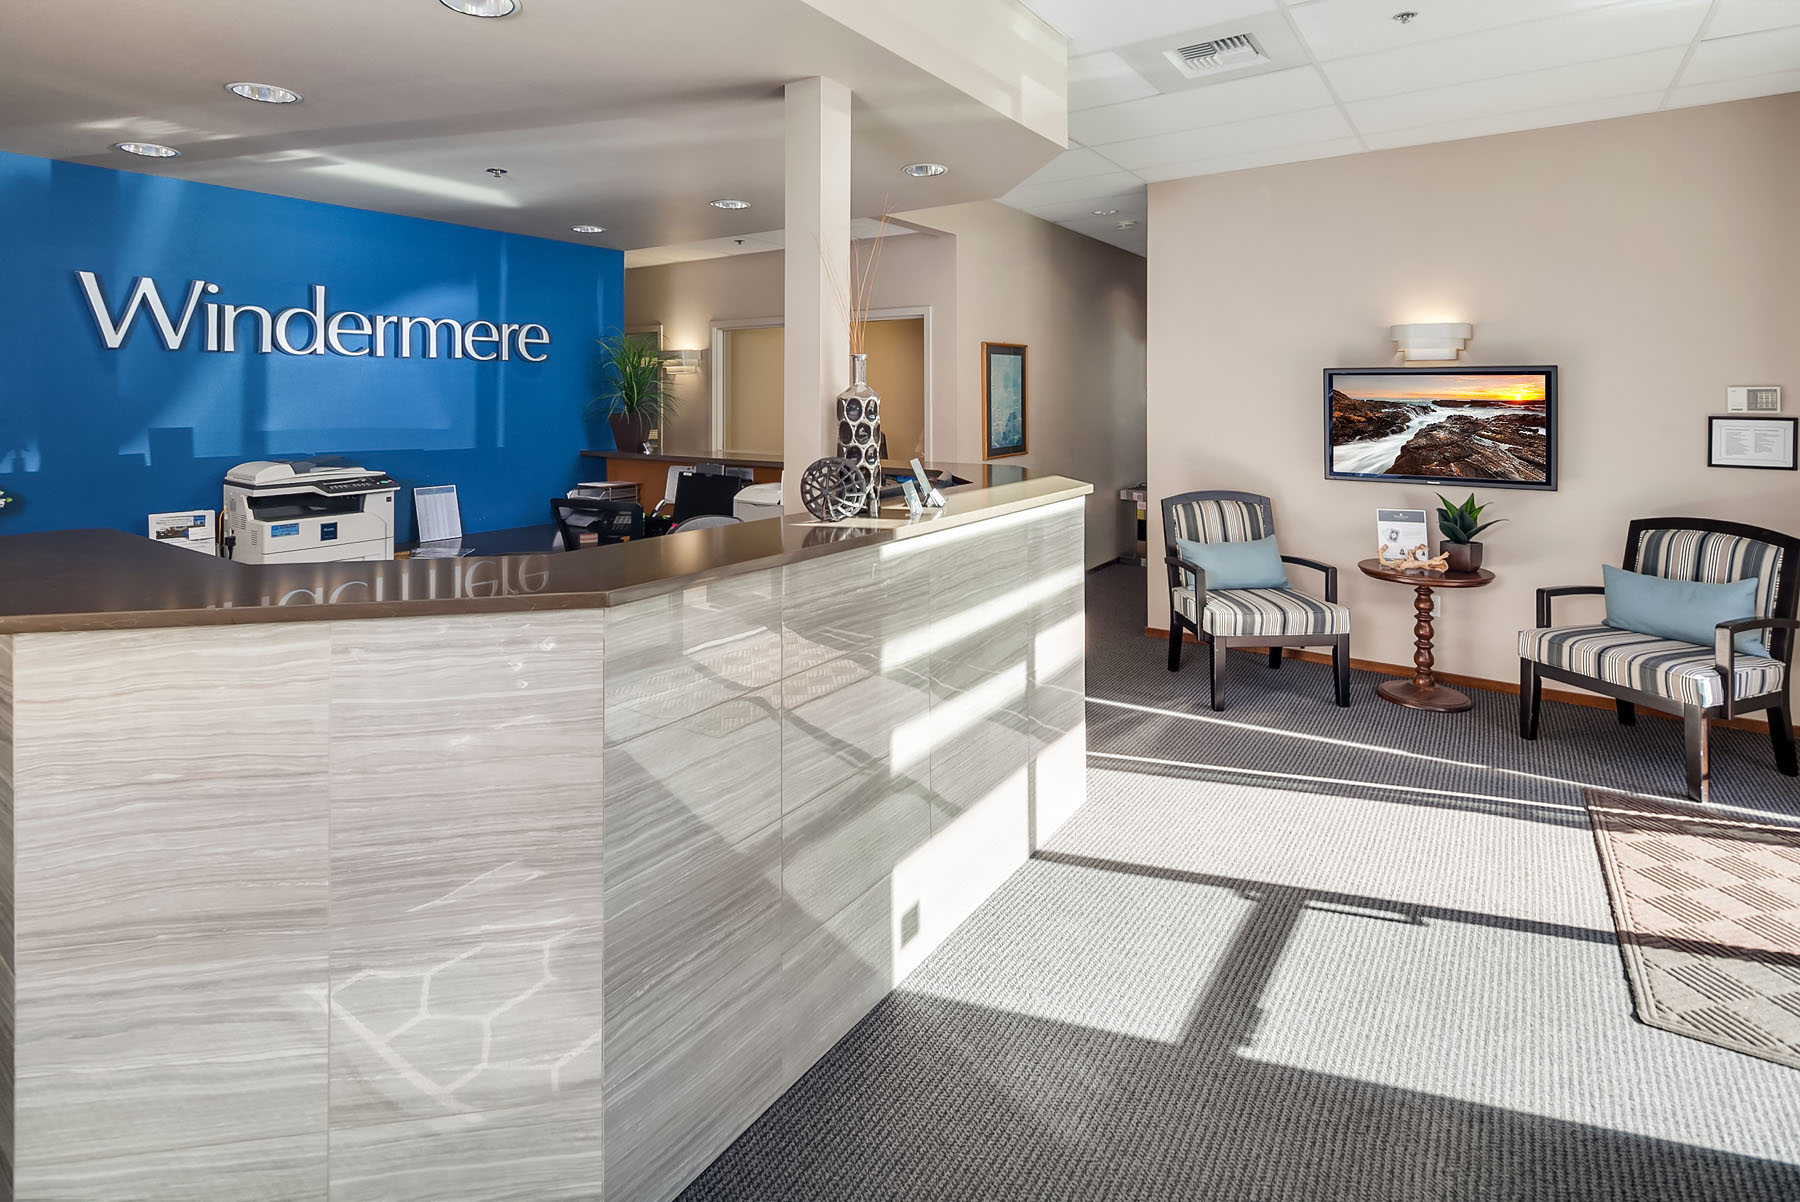 Windermere Real Estate Gig Harbor_Gig Harbor_Washington_Welcome_Lobby